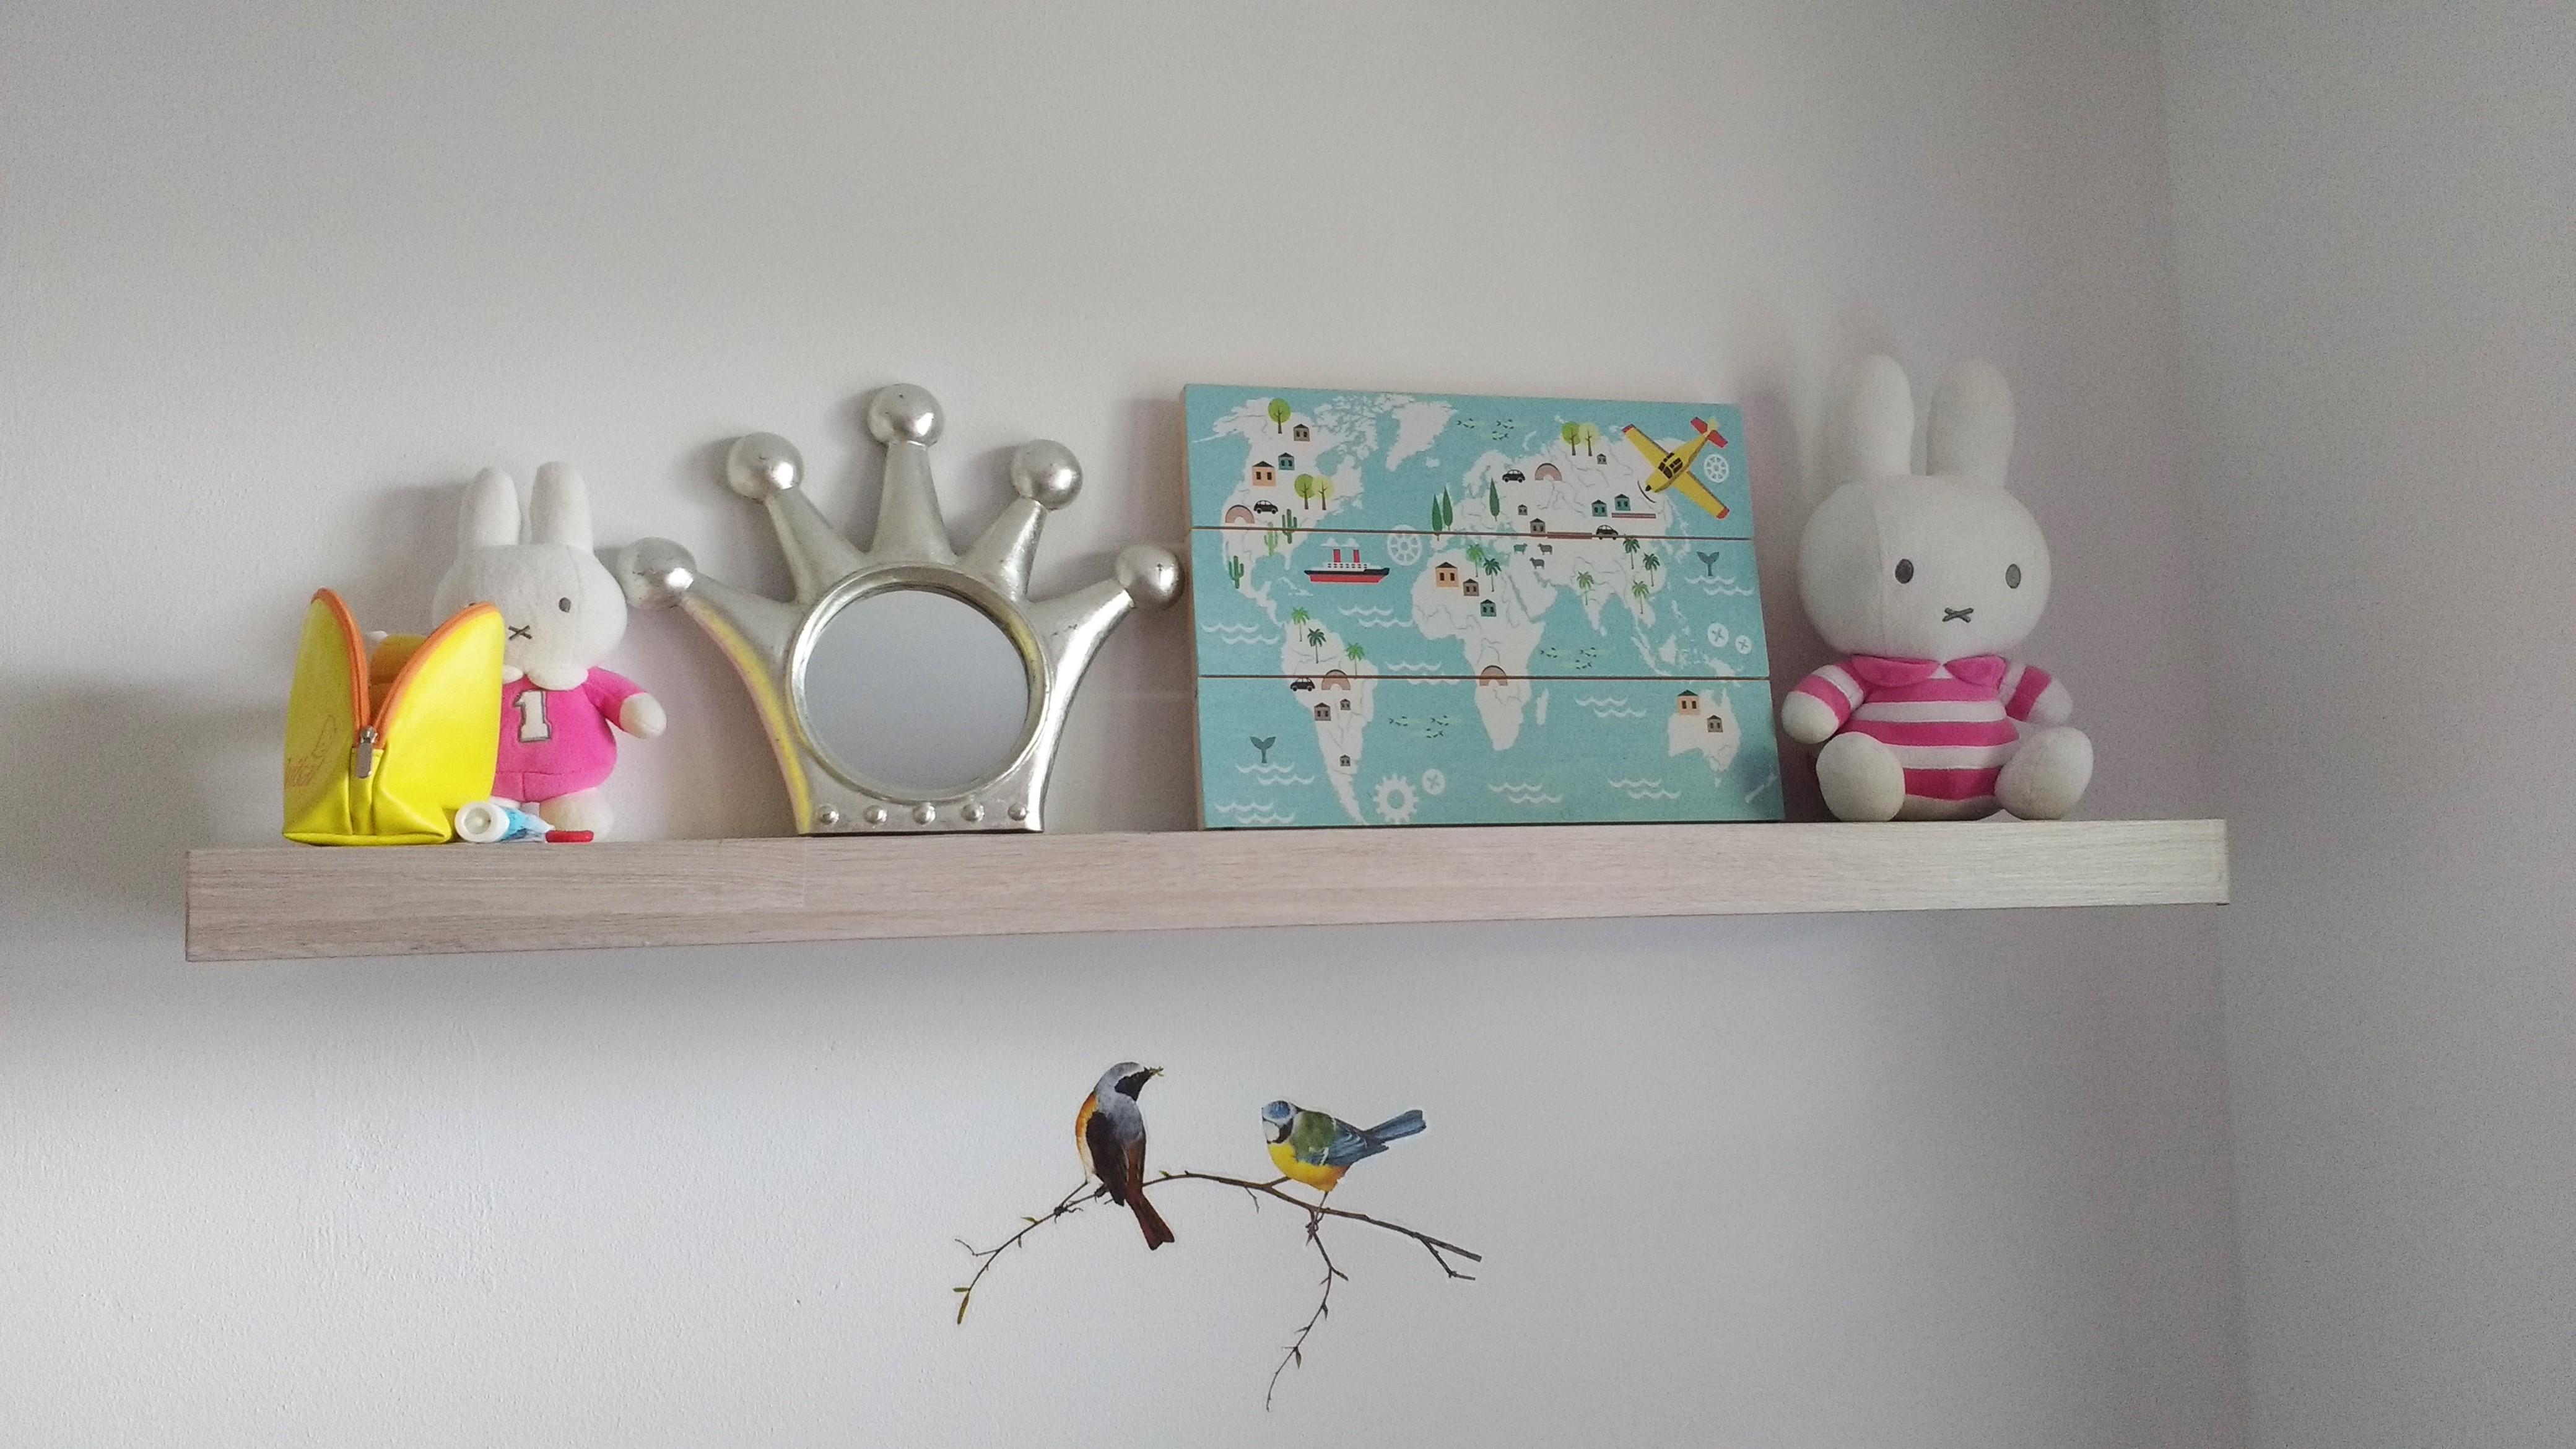 peuterkamer, kinderkamer, blog, accessoires, wereldkaart, landkaart, lifestyleblog, mamablog, La Log